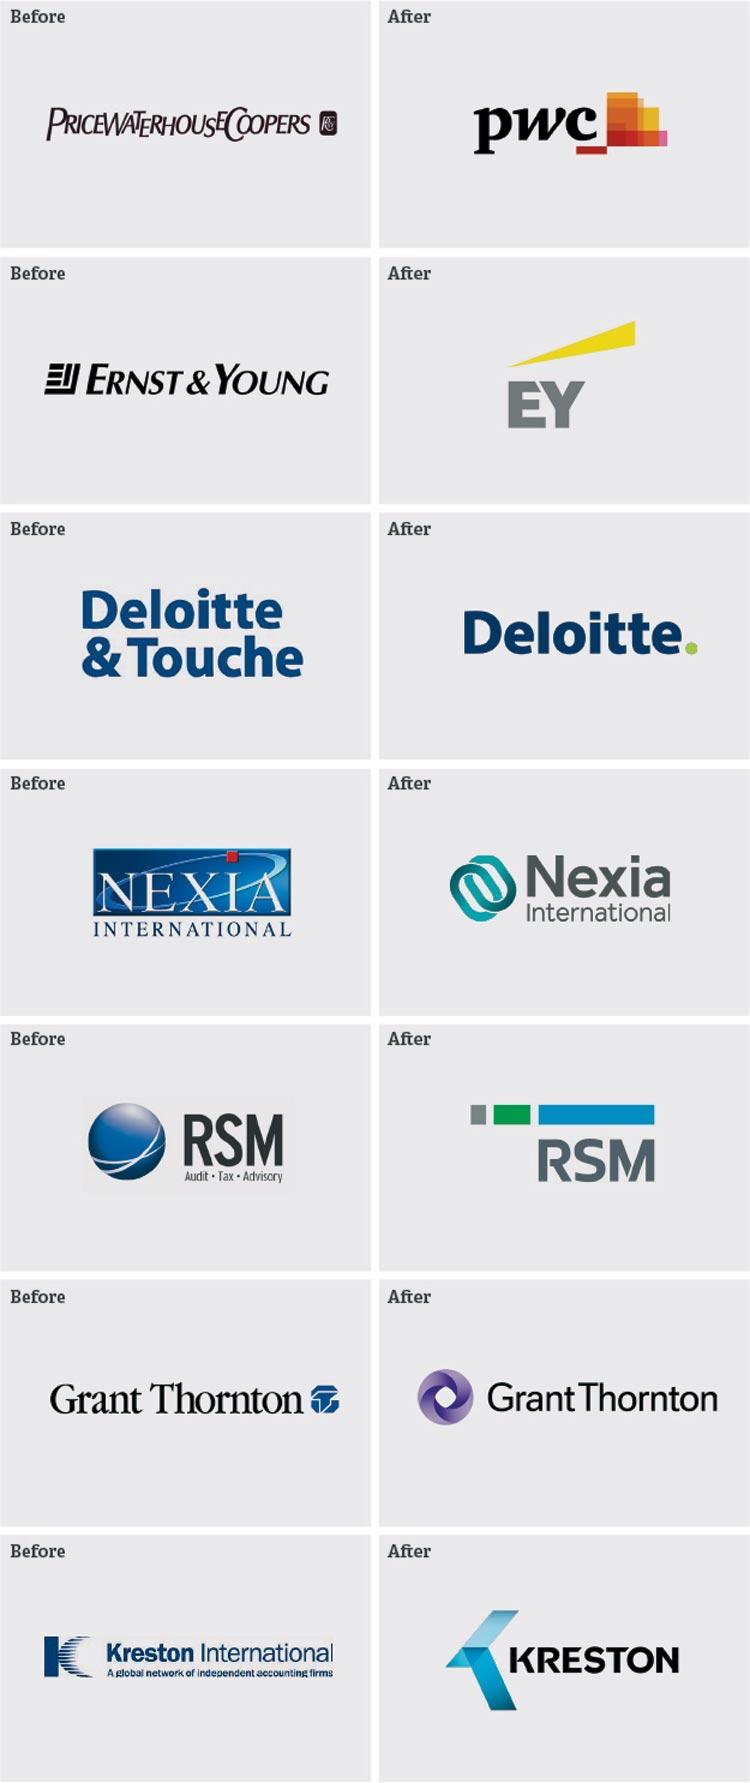 Accountancy-Firm-Rebrands